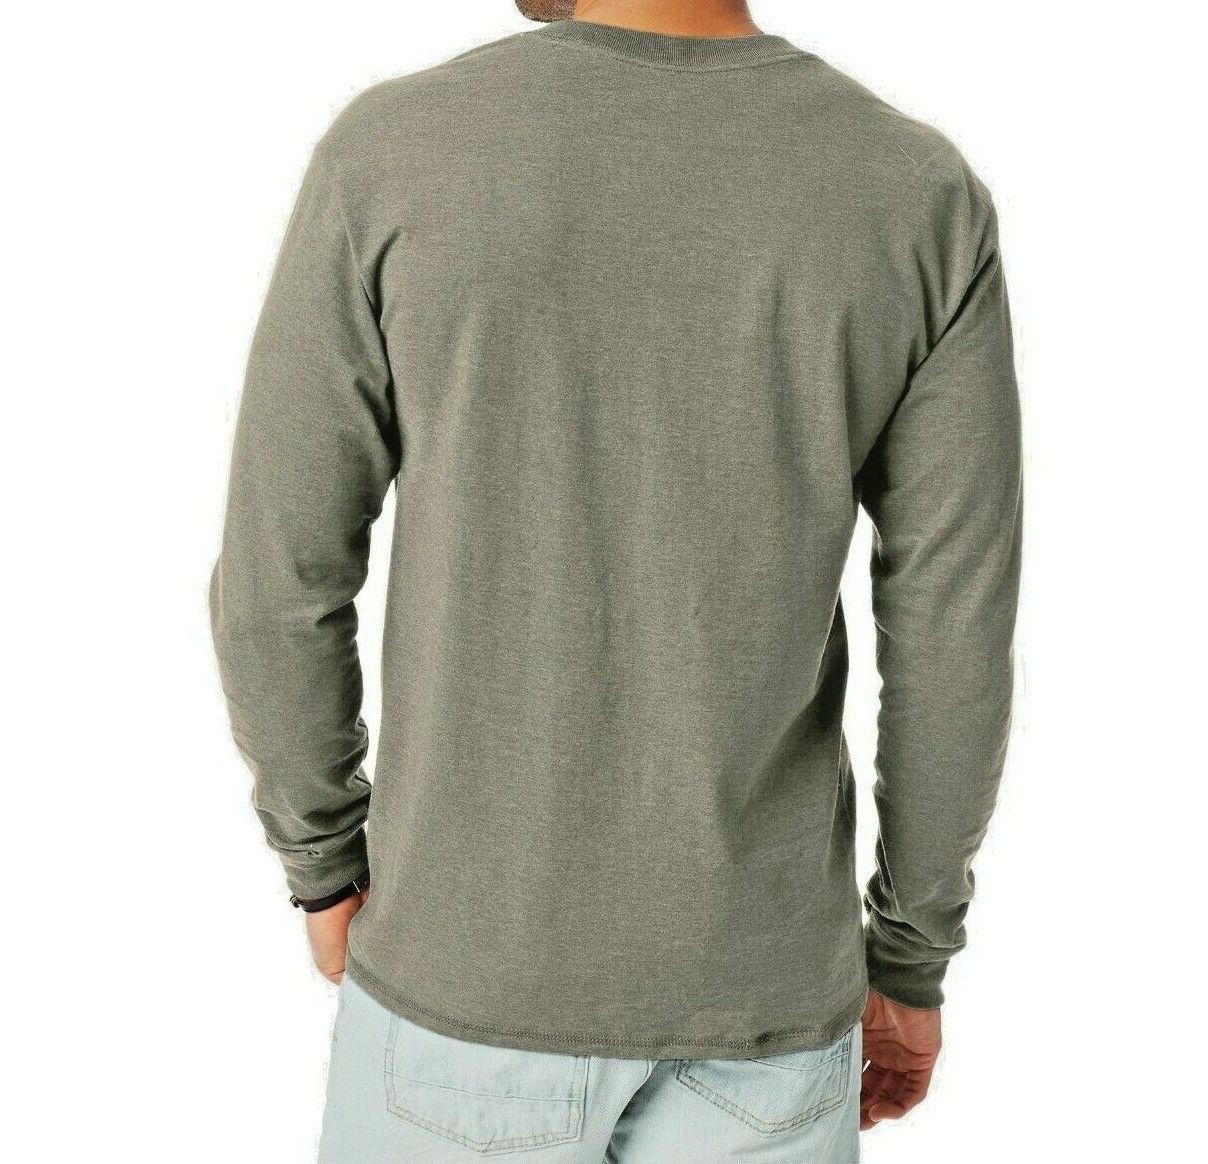 Hanes Beefy-T Men's Long-Sleeve T-shirt Gray